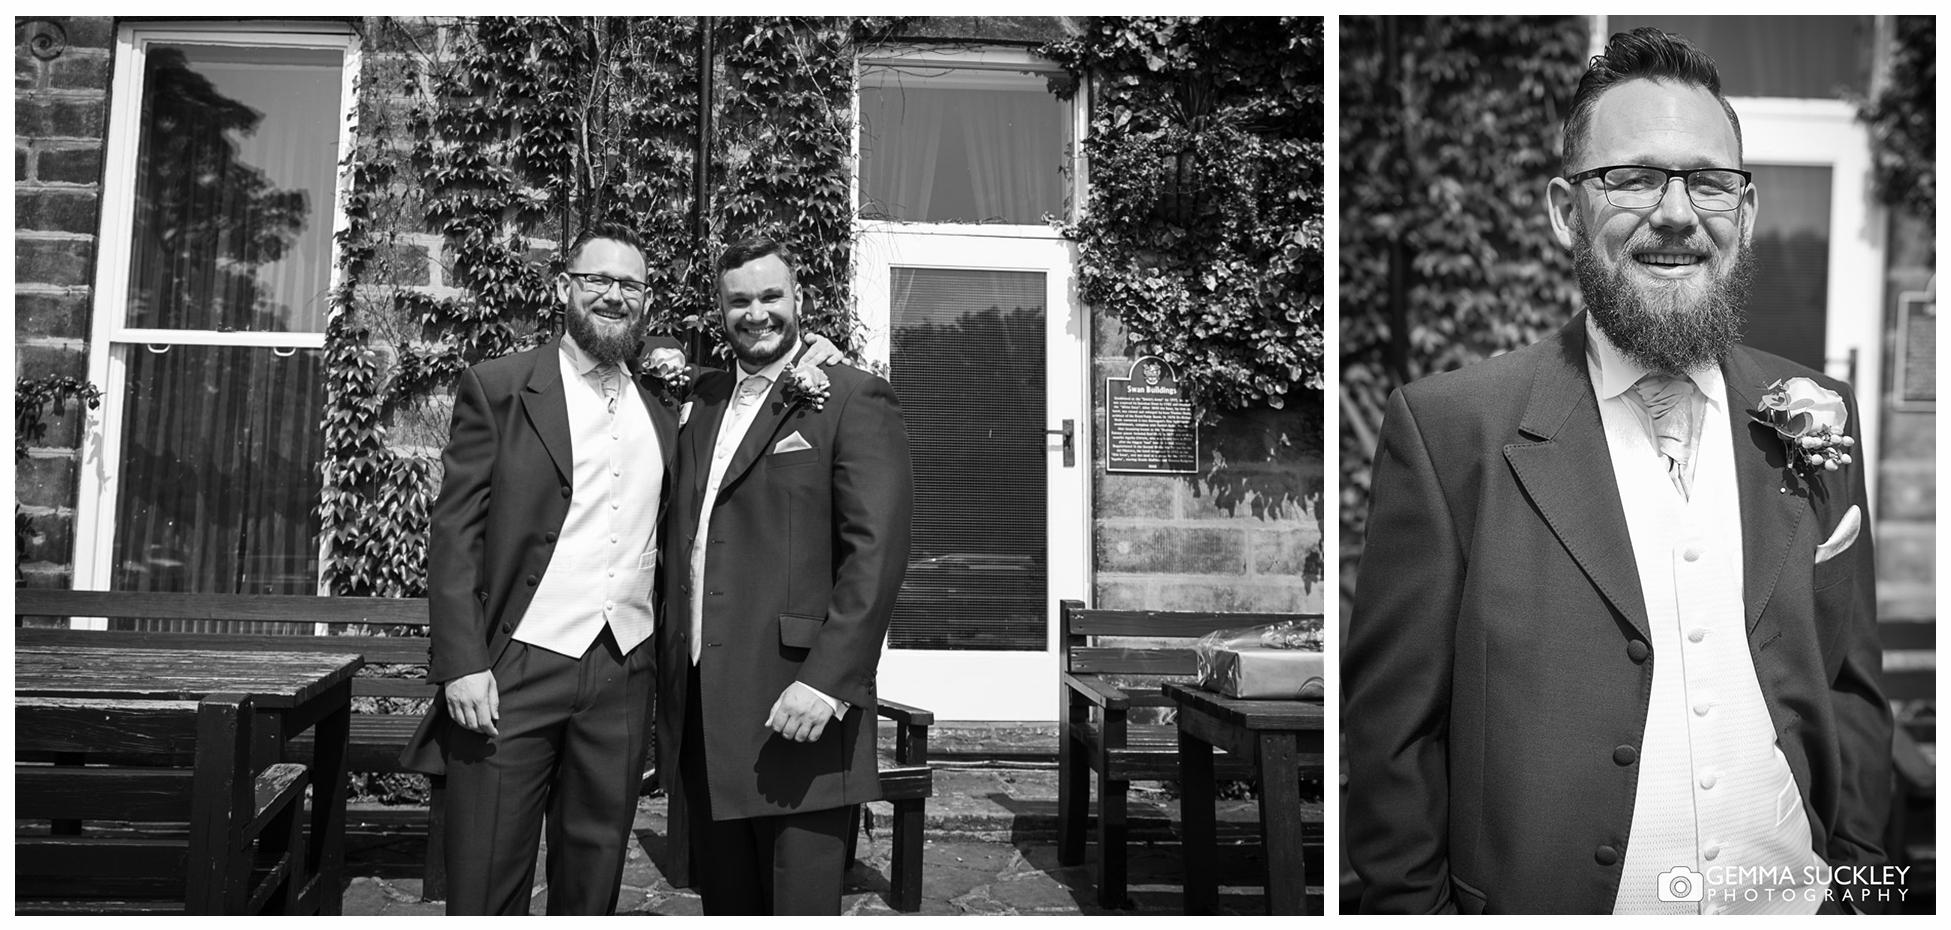 groom-prep©gemmasuckleyphotography.jpg